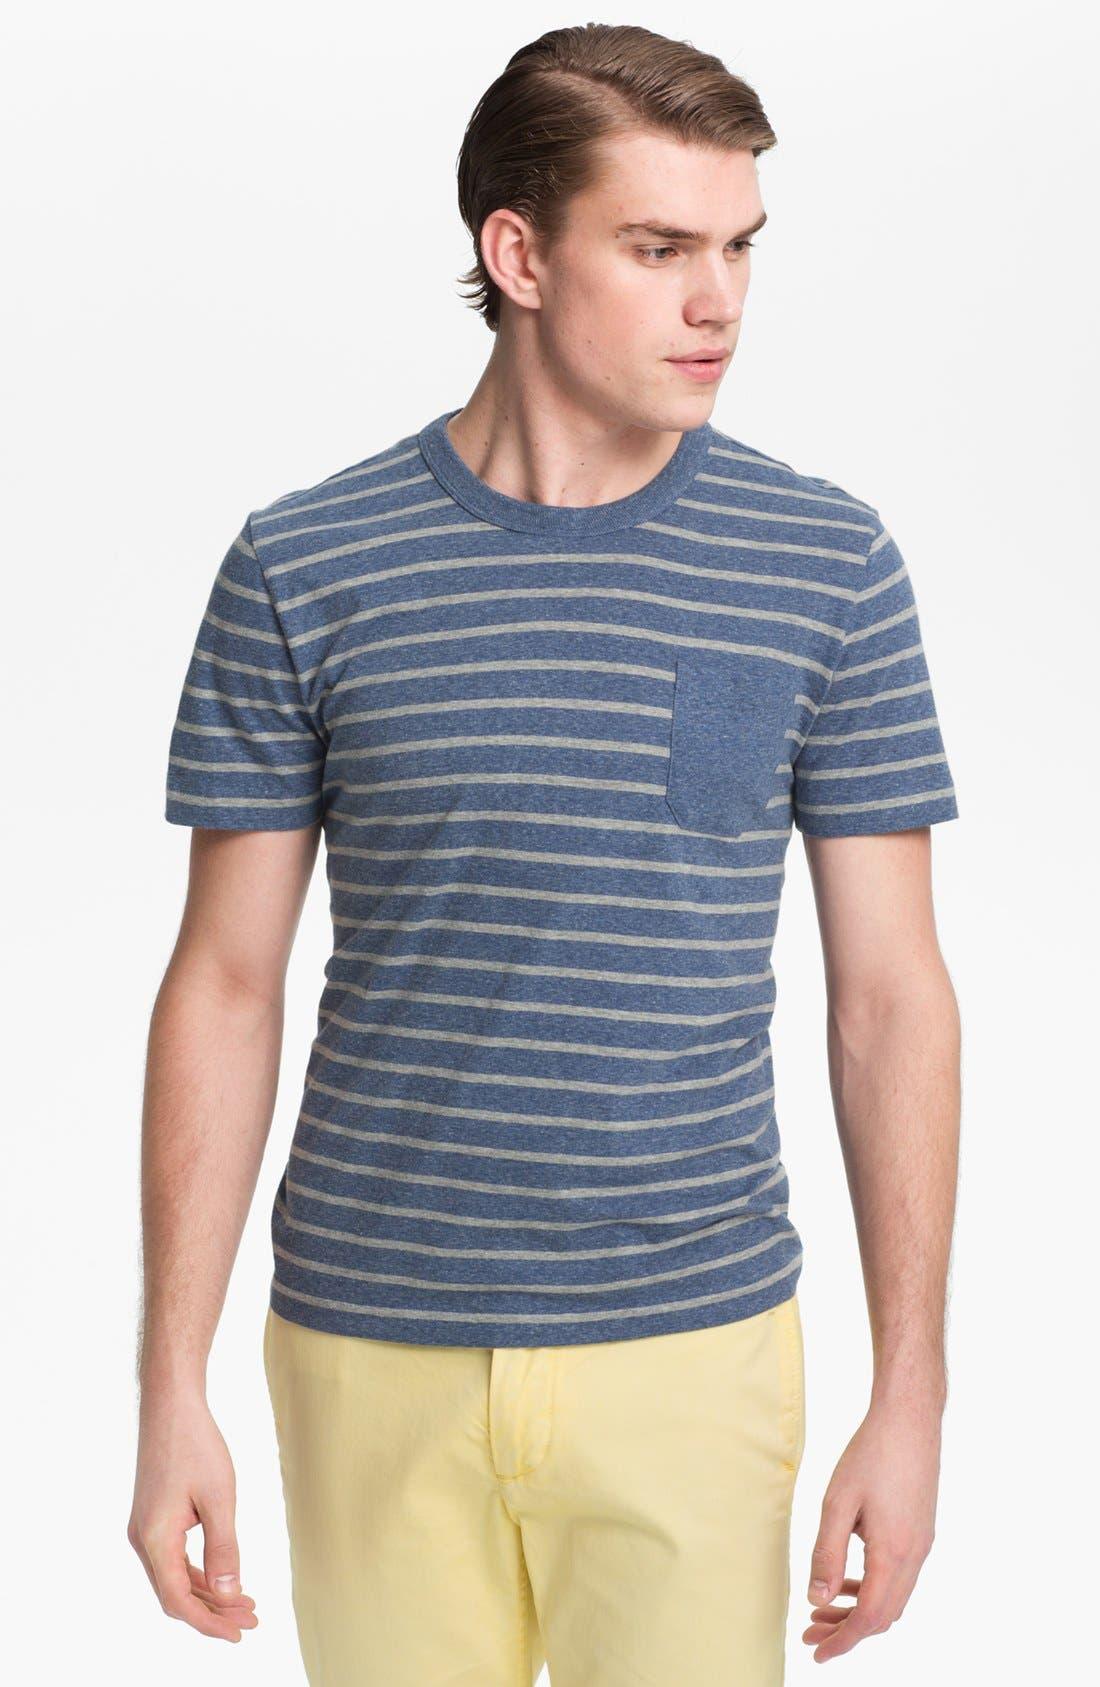 Main Image - Jack Spade 'Calvin' Stripe Pocket T-Shirt